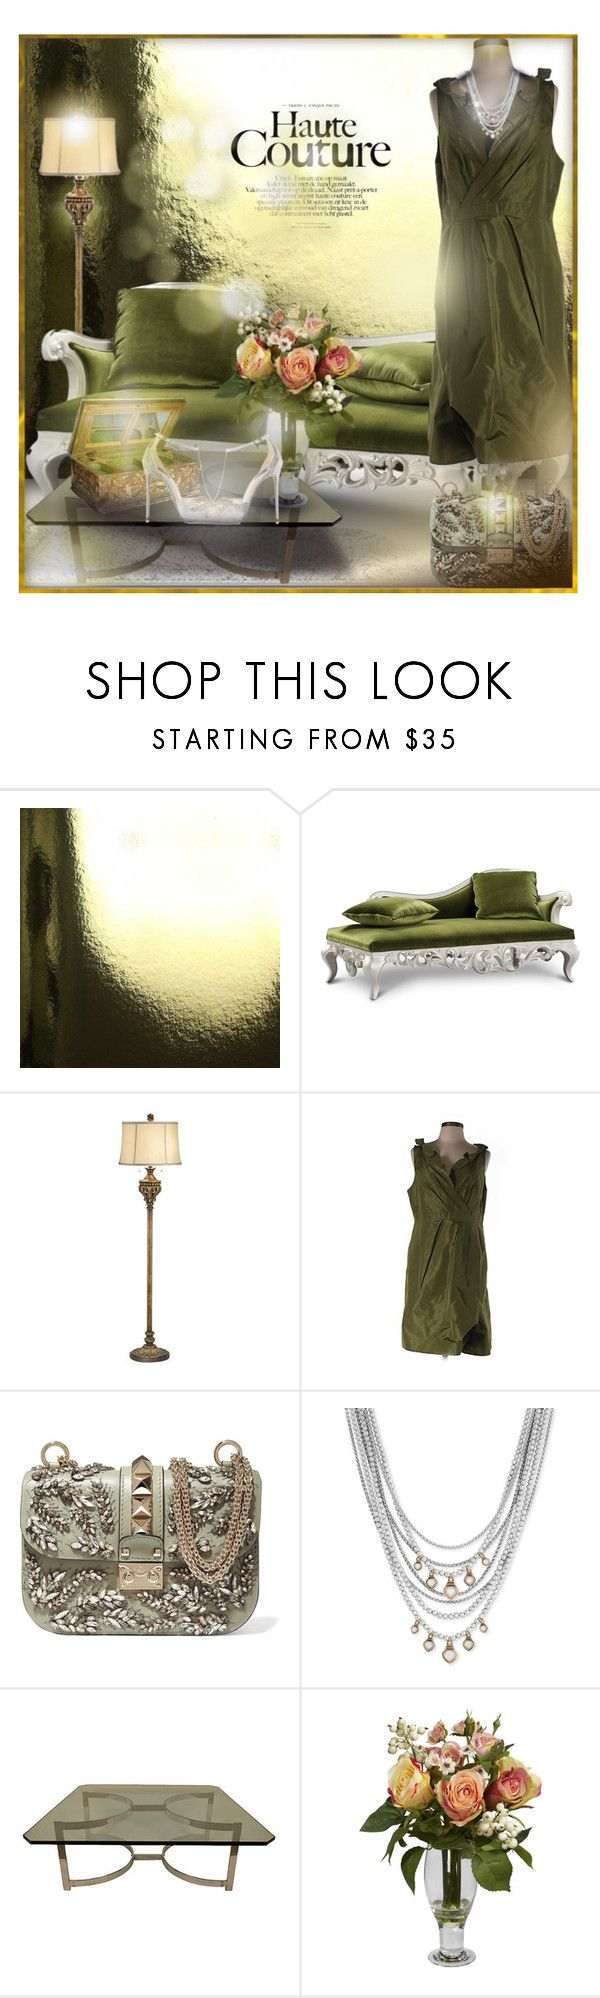 Green Day by falticska-cerasella on Polyvore featuring interior, interiors, interior design, Casa, home decor, interior decorating, Claudette, Lumière, Burke Decor and Nearly Natural